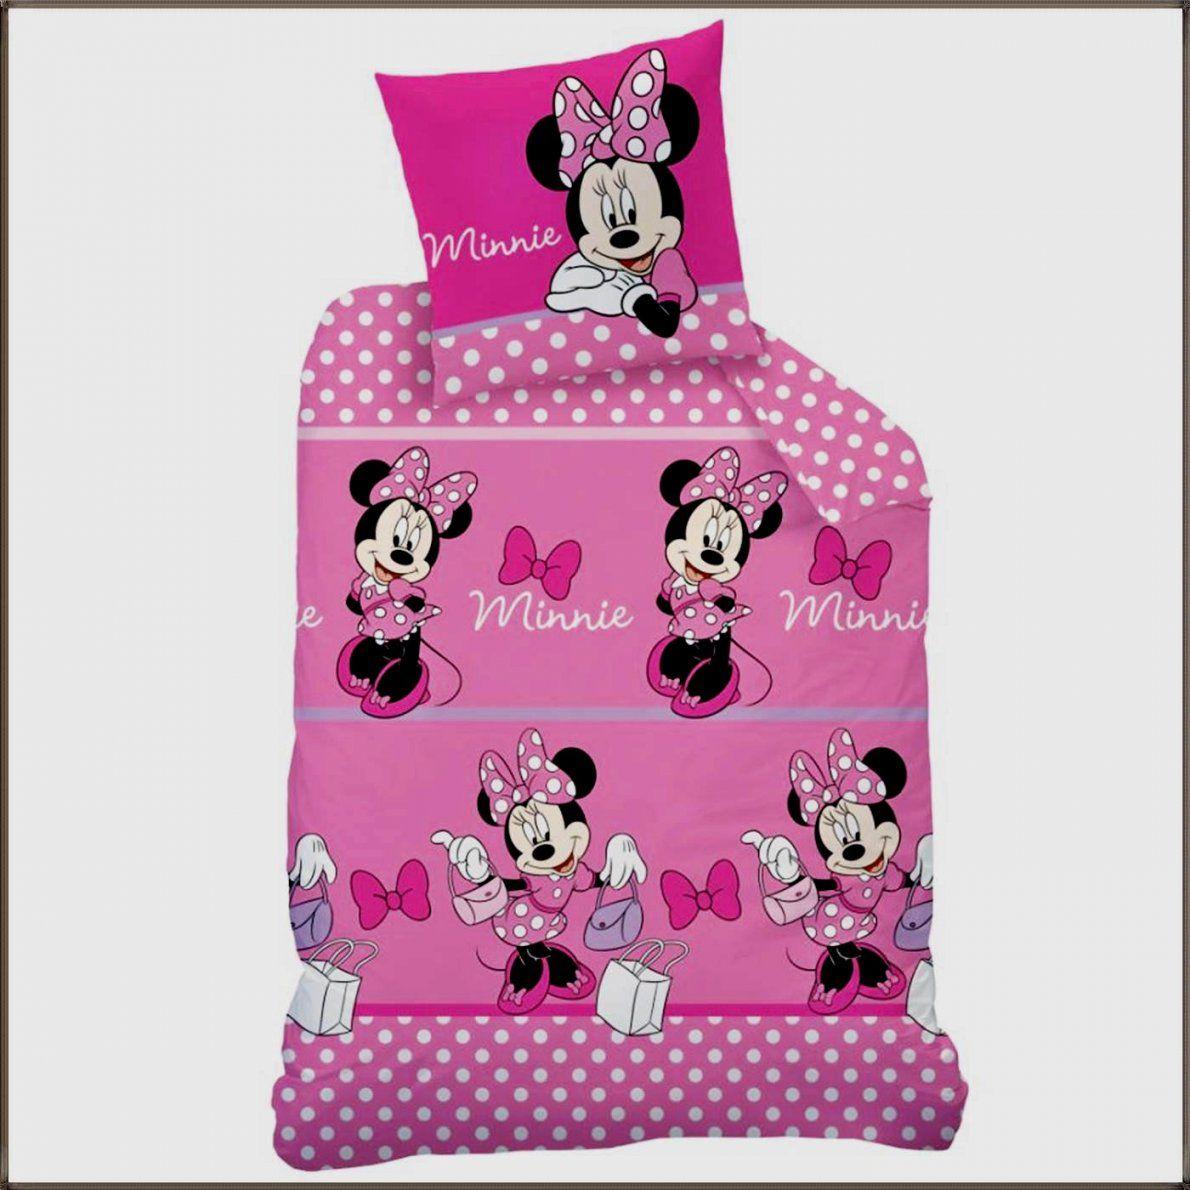 Minni Mouse Bettwäsche | Bettwäsche 70x140 Minnie Mouse Hause ...